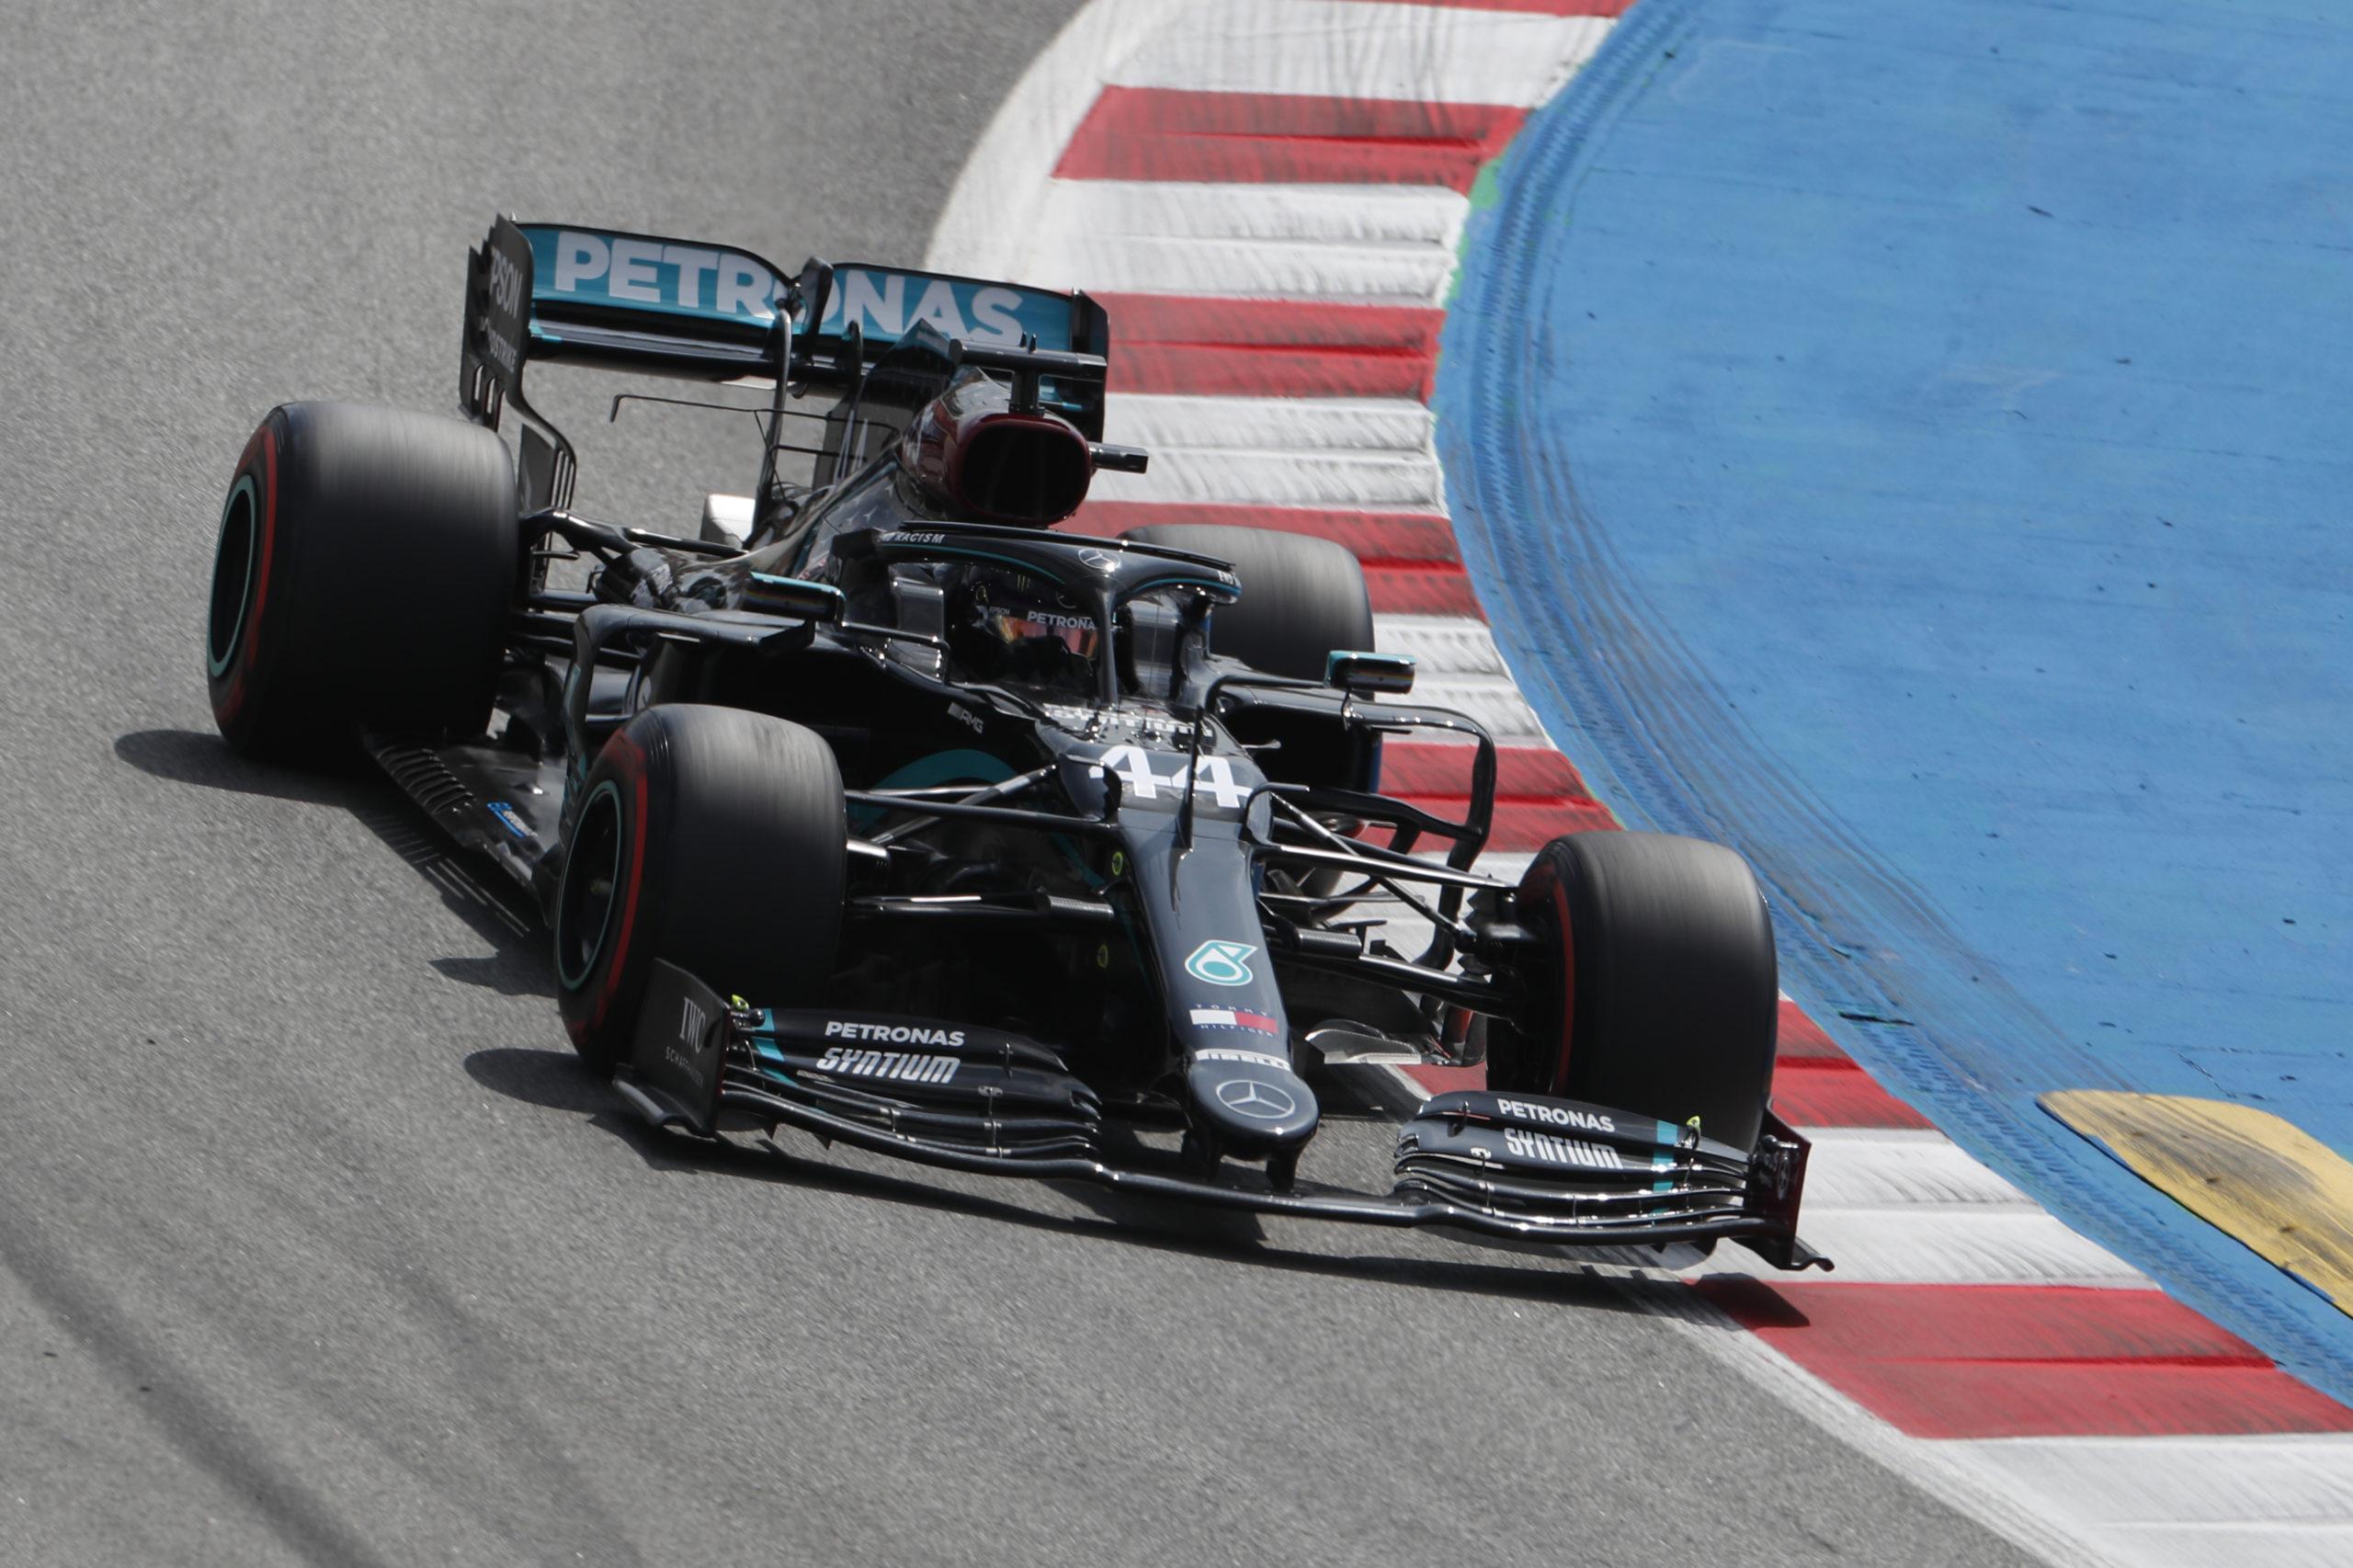 2020 Spanish Grand Prix, Friday - LAT Images, Mercedes, Hamilton